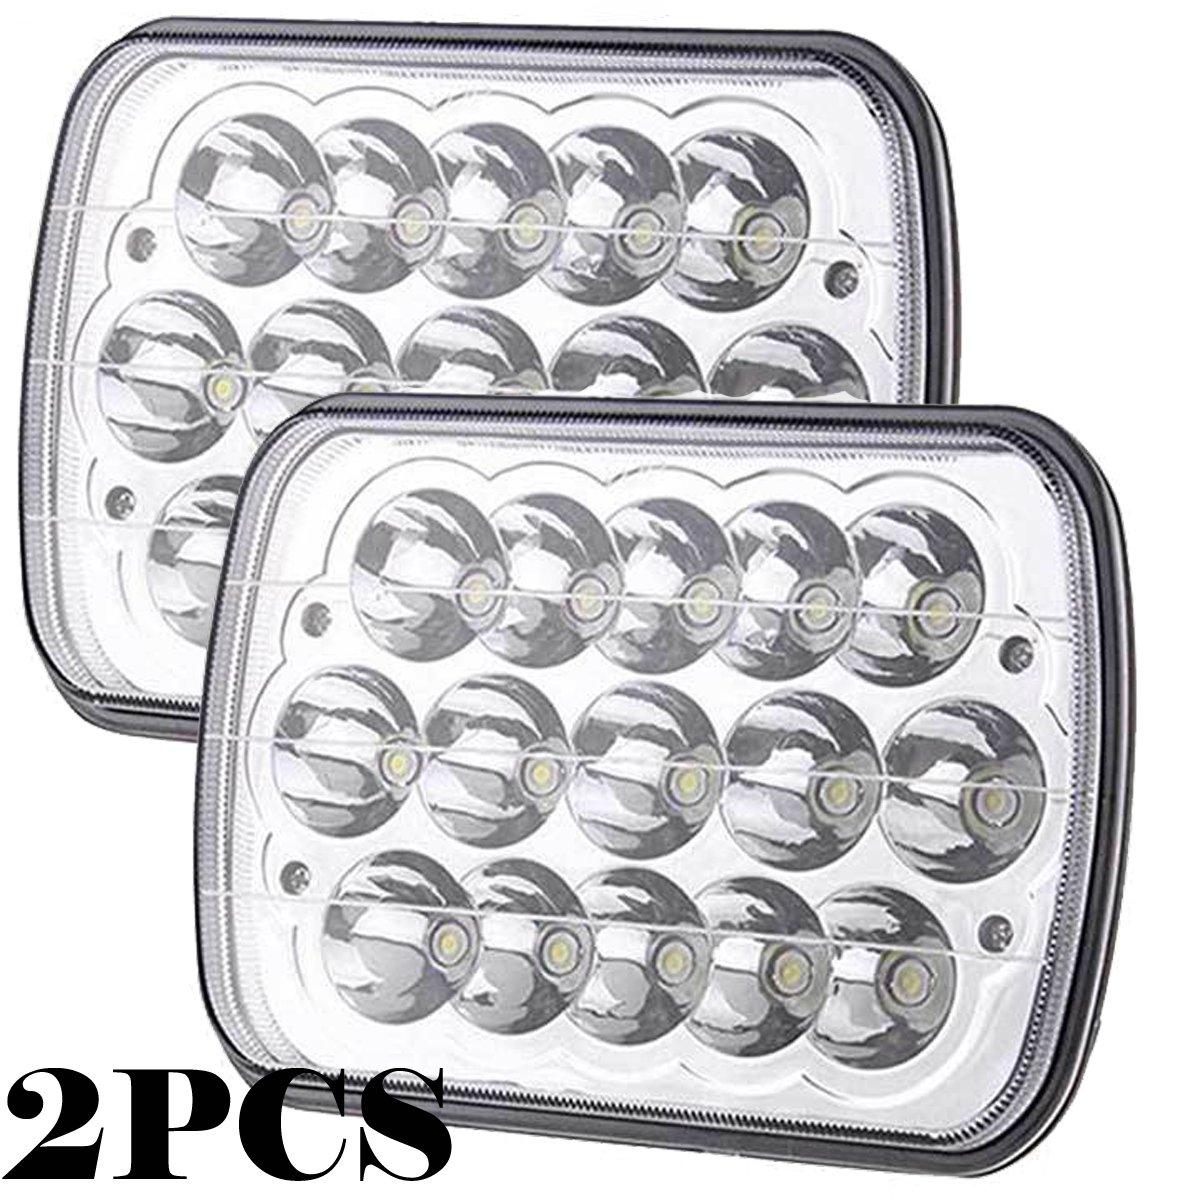 Amazon com: 7x6 5x7 Inch LED Headlights Fog Lights Bulb For Trucks